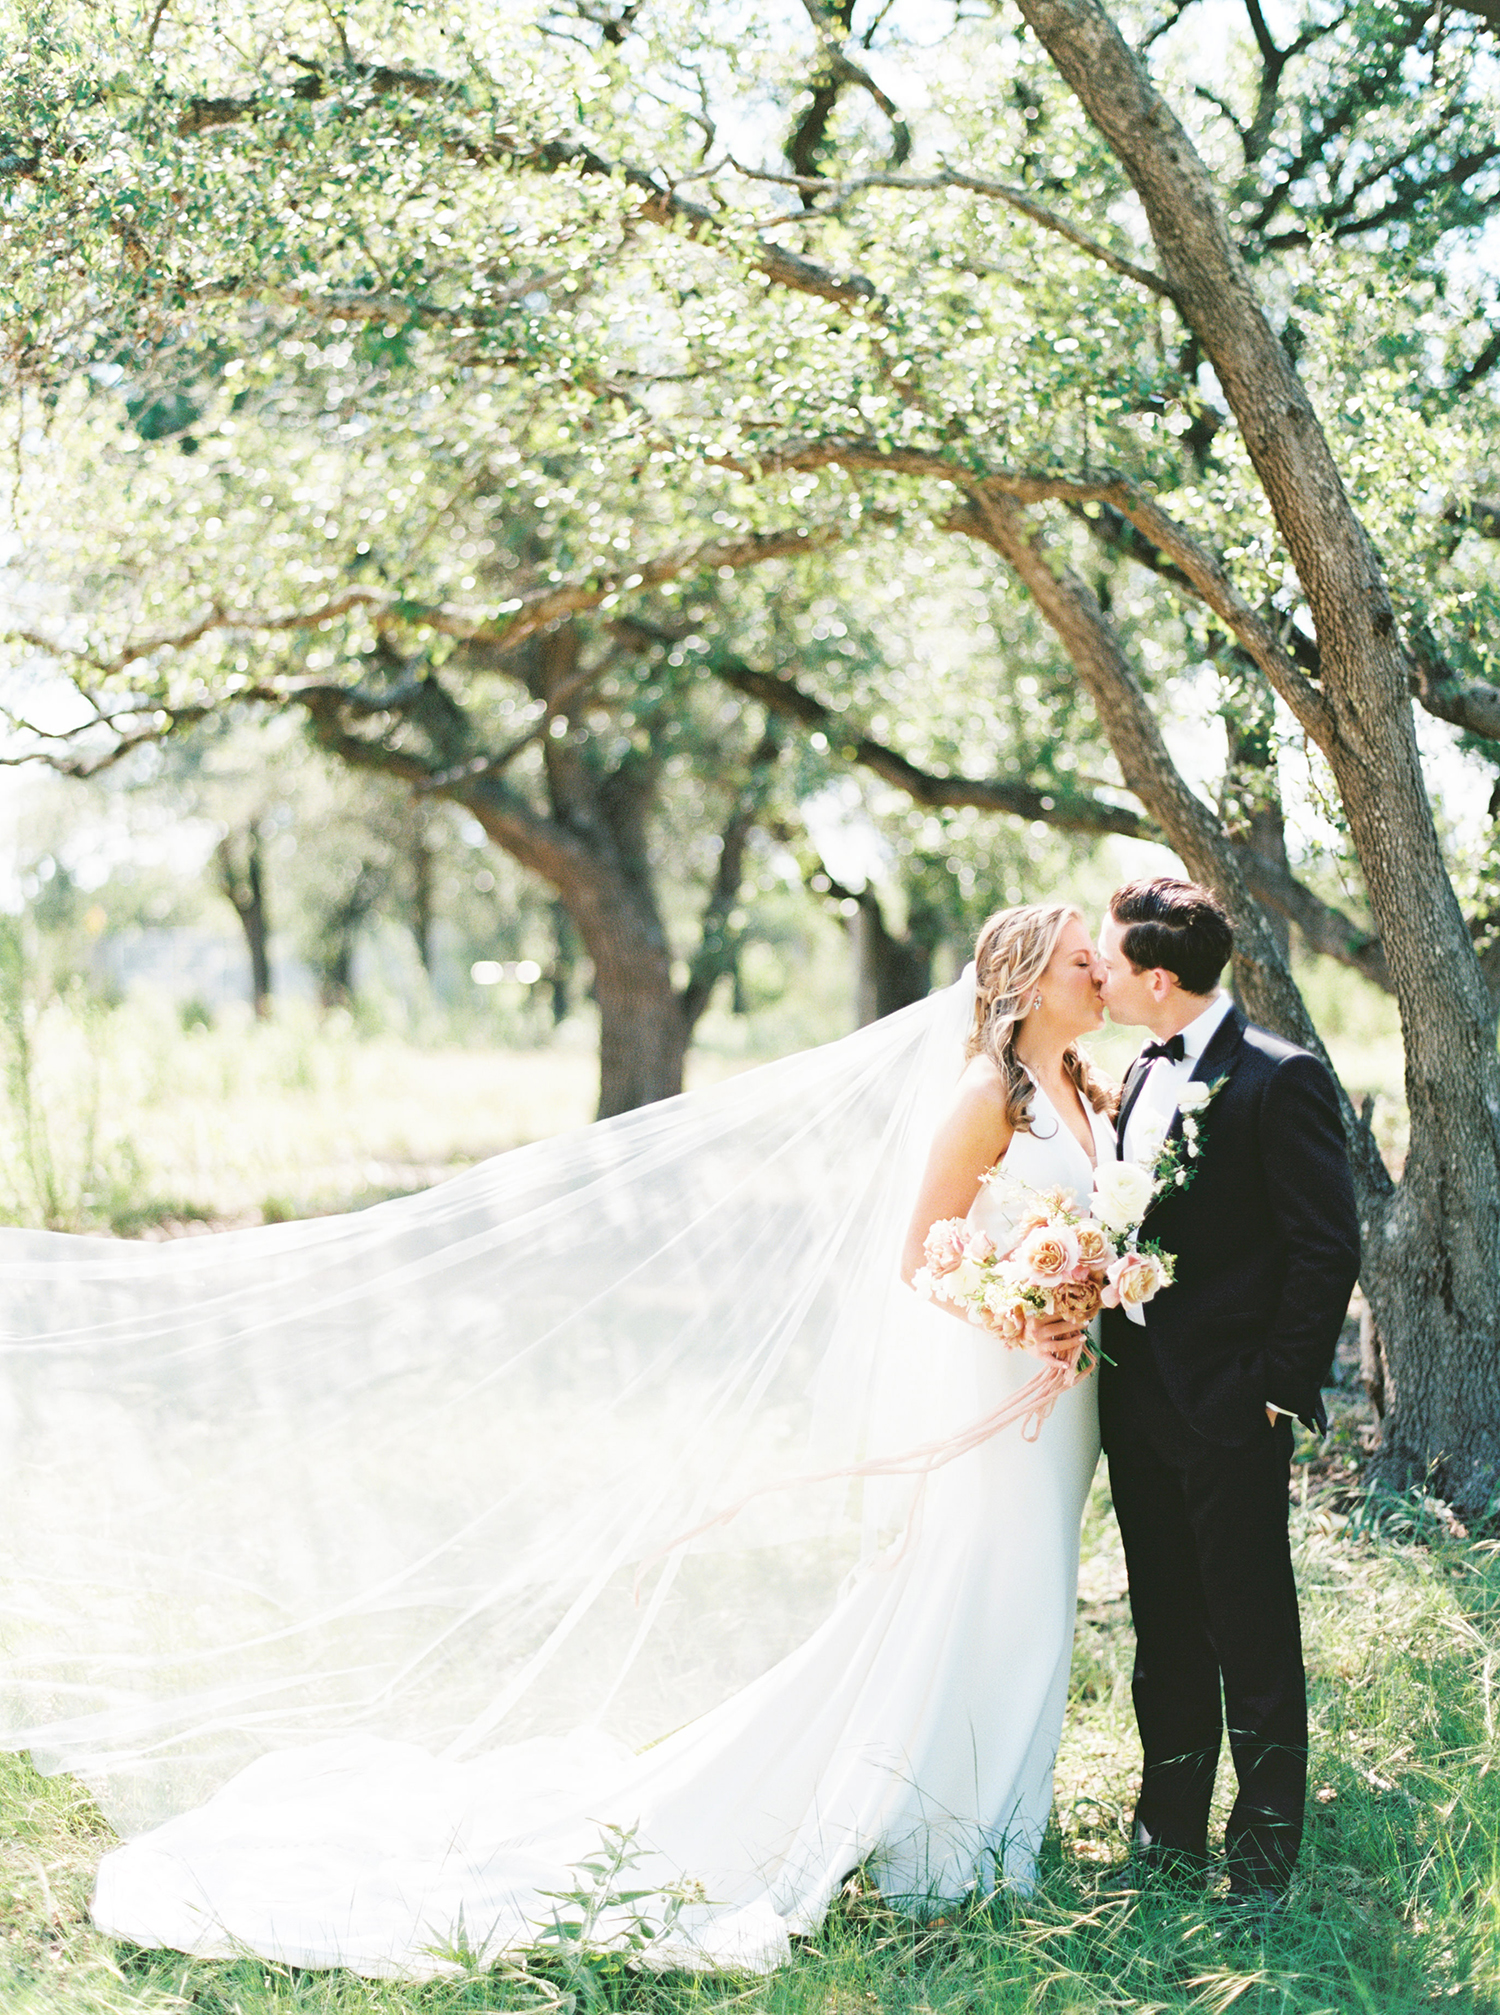 amanda chuck wedding couple kiss under the trees